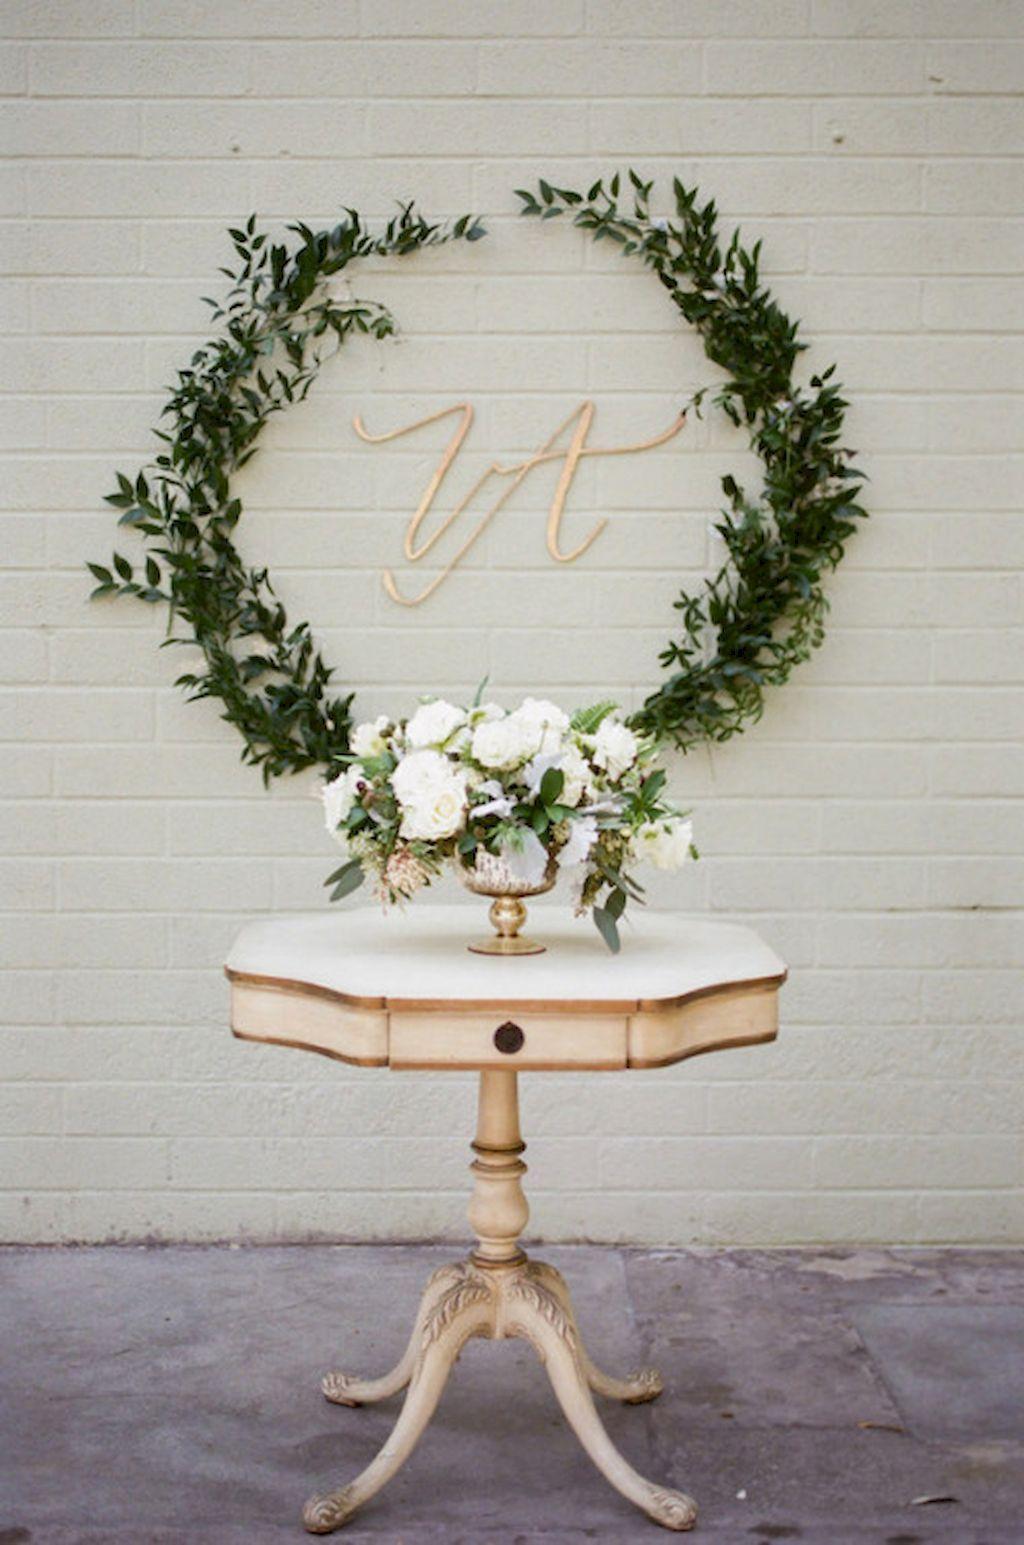 Simple Greenery Wedding Centerpieces Decor Ideas  BuJ Rehearsal